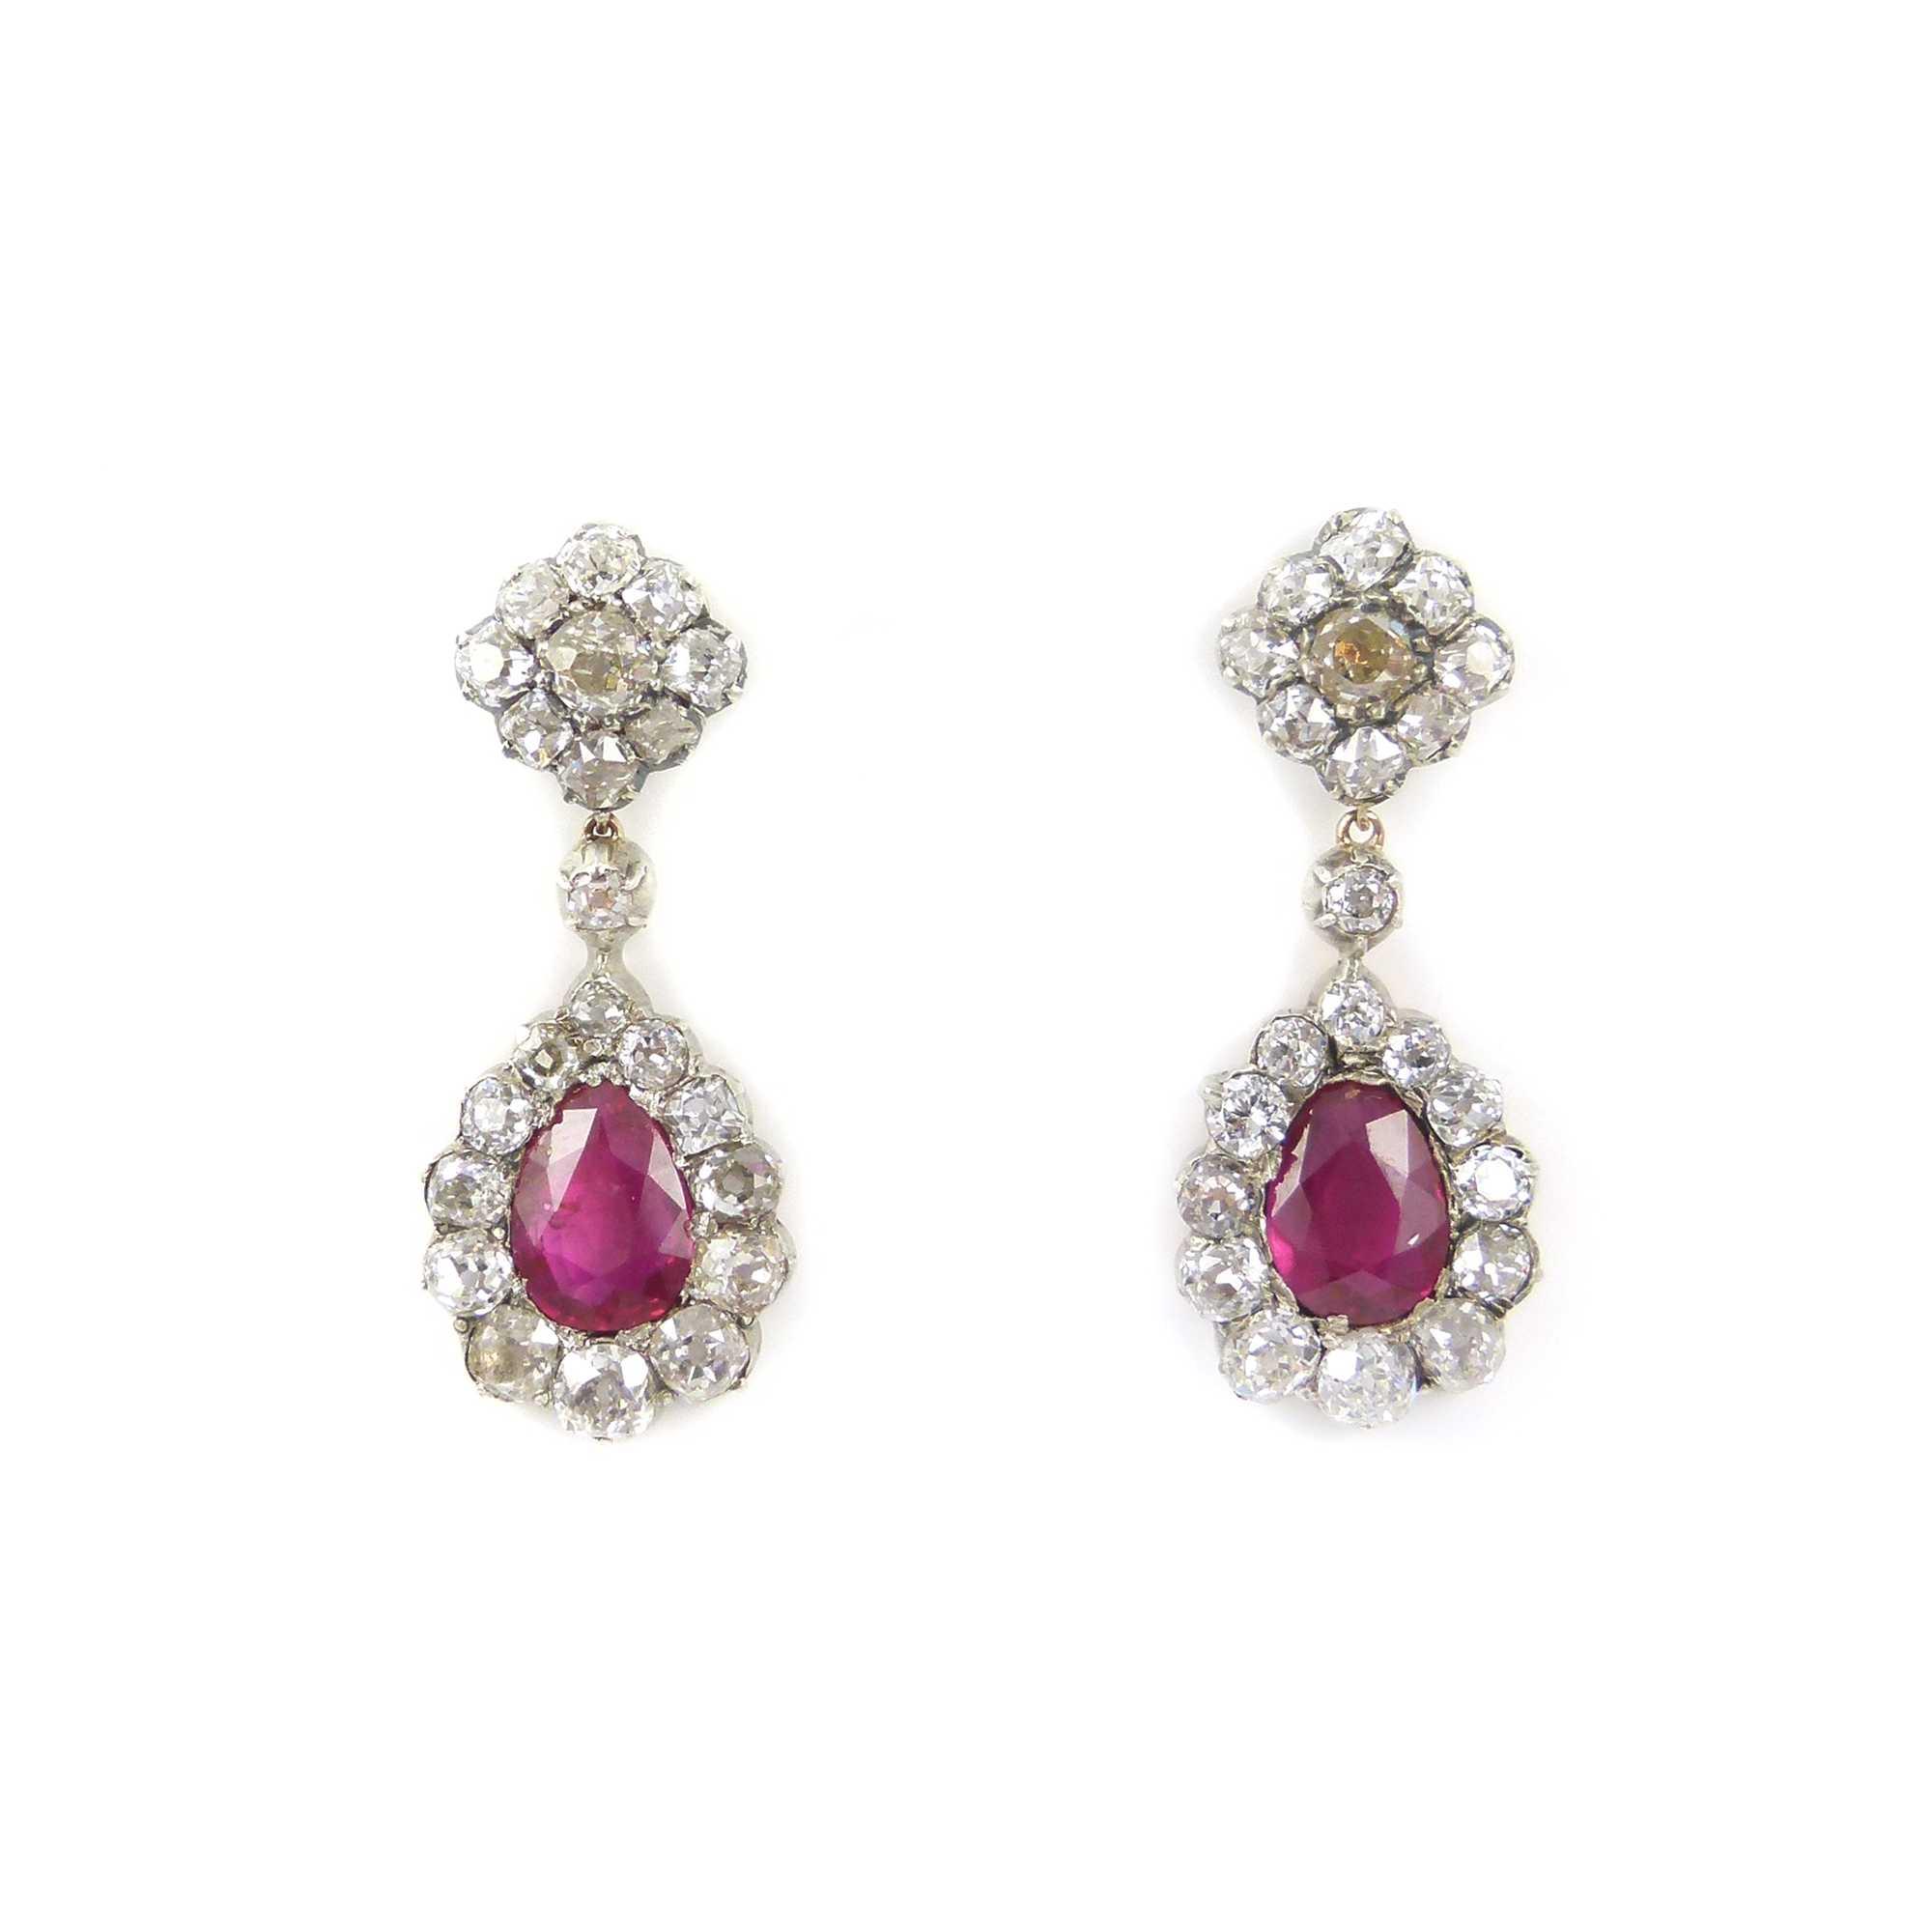 Sapphire and Diamonds earrings